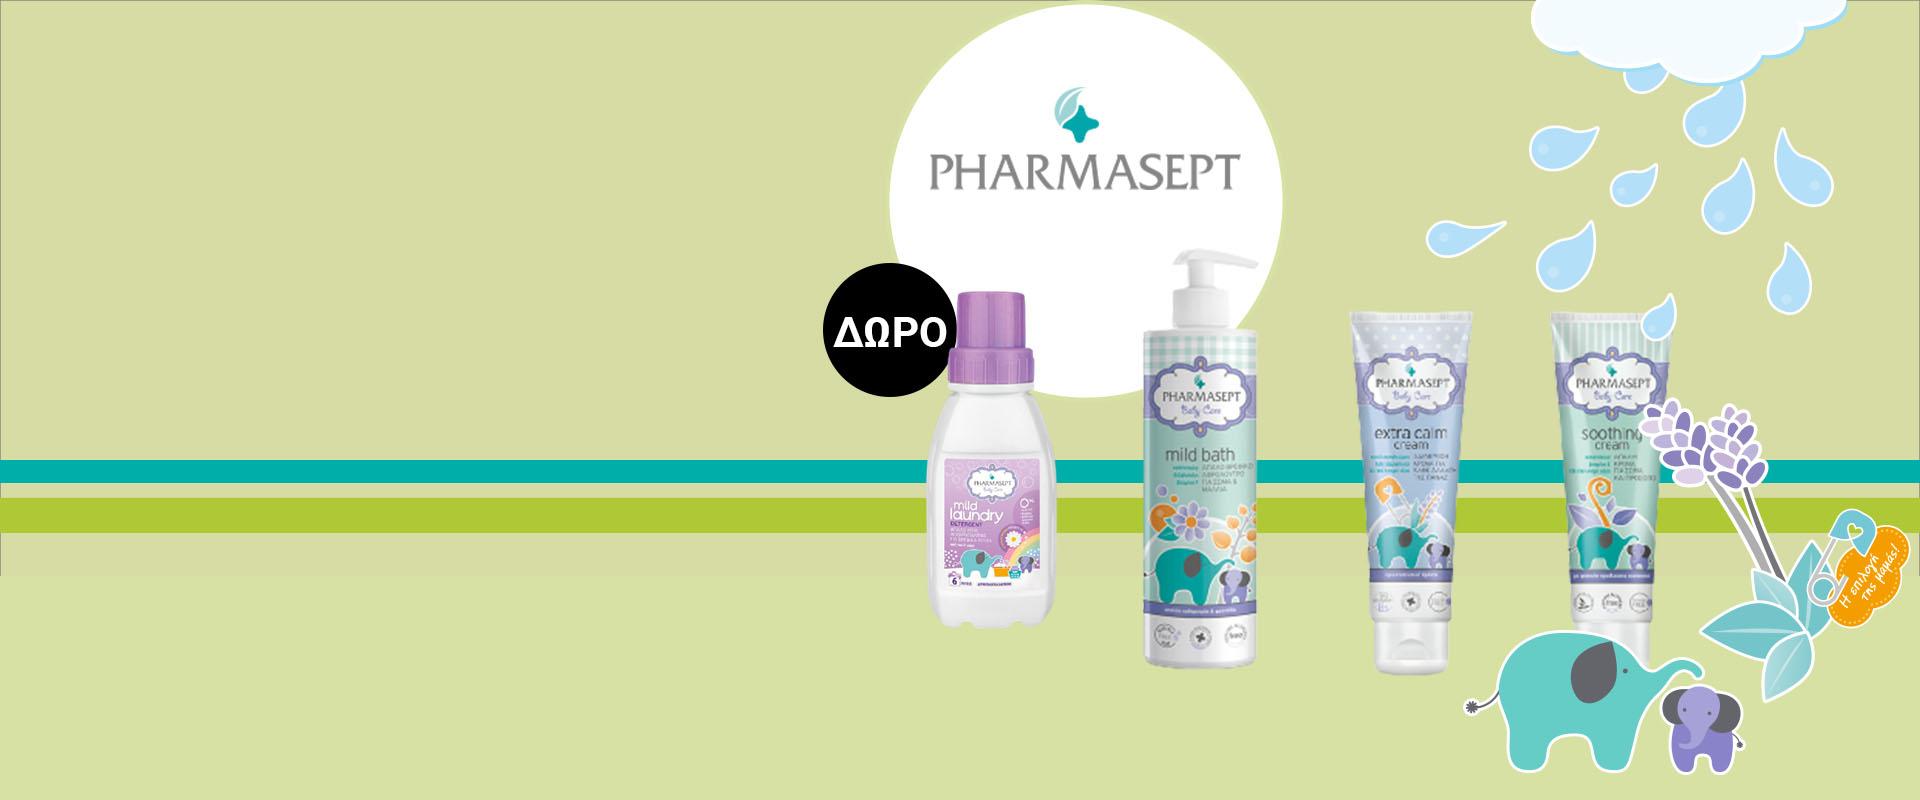 Pharmasept βρεφικό πακέτο περιποίησης με -50%!